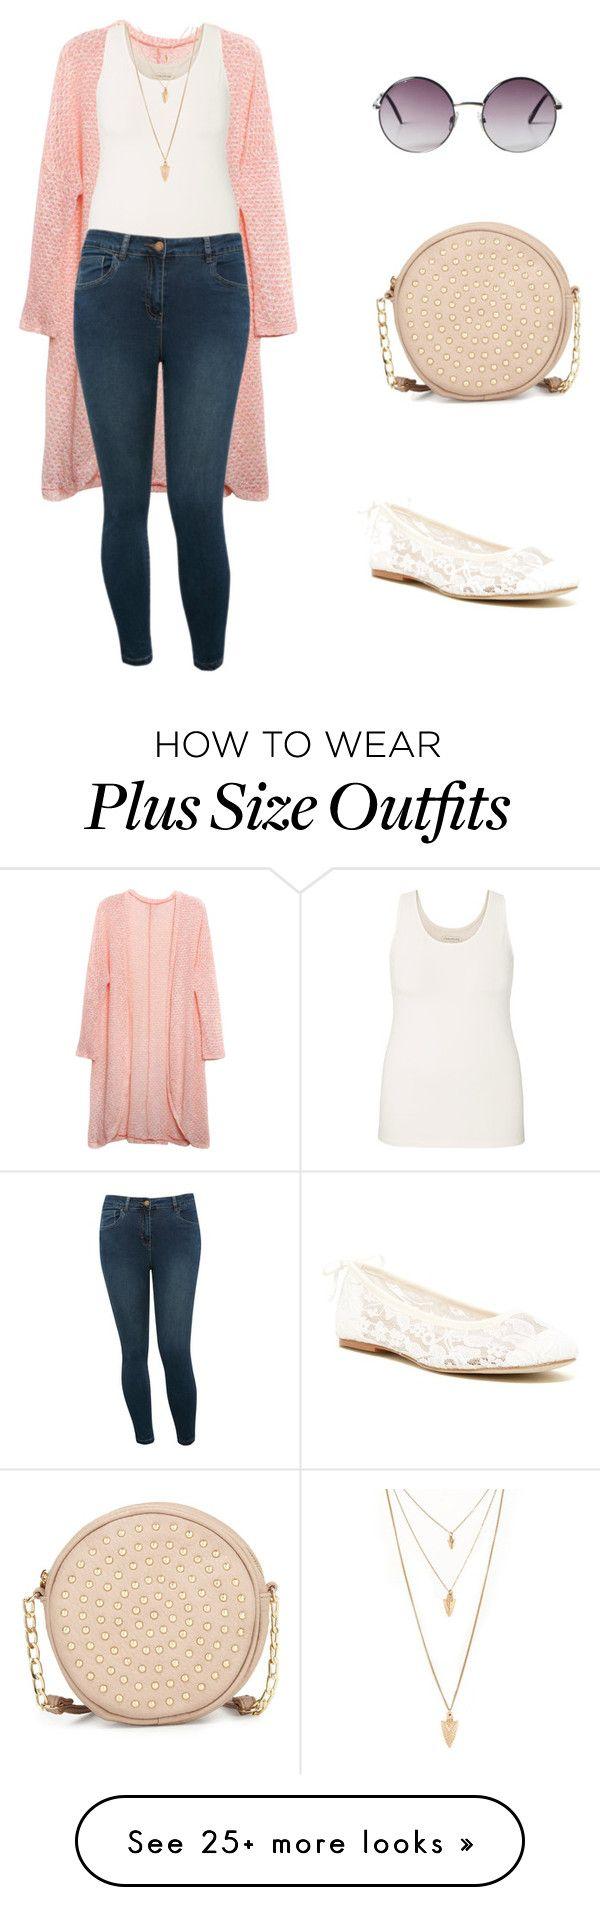 zapatos bancos Jeans Blusa sin manga blanca Sueter rosa claro